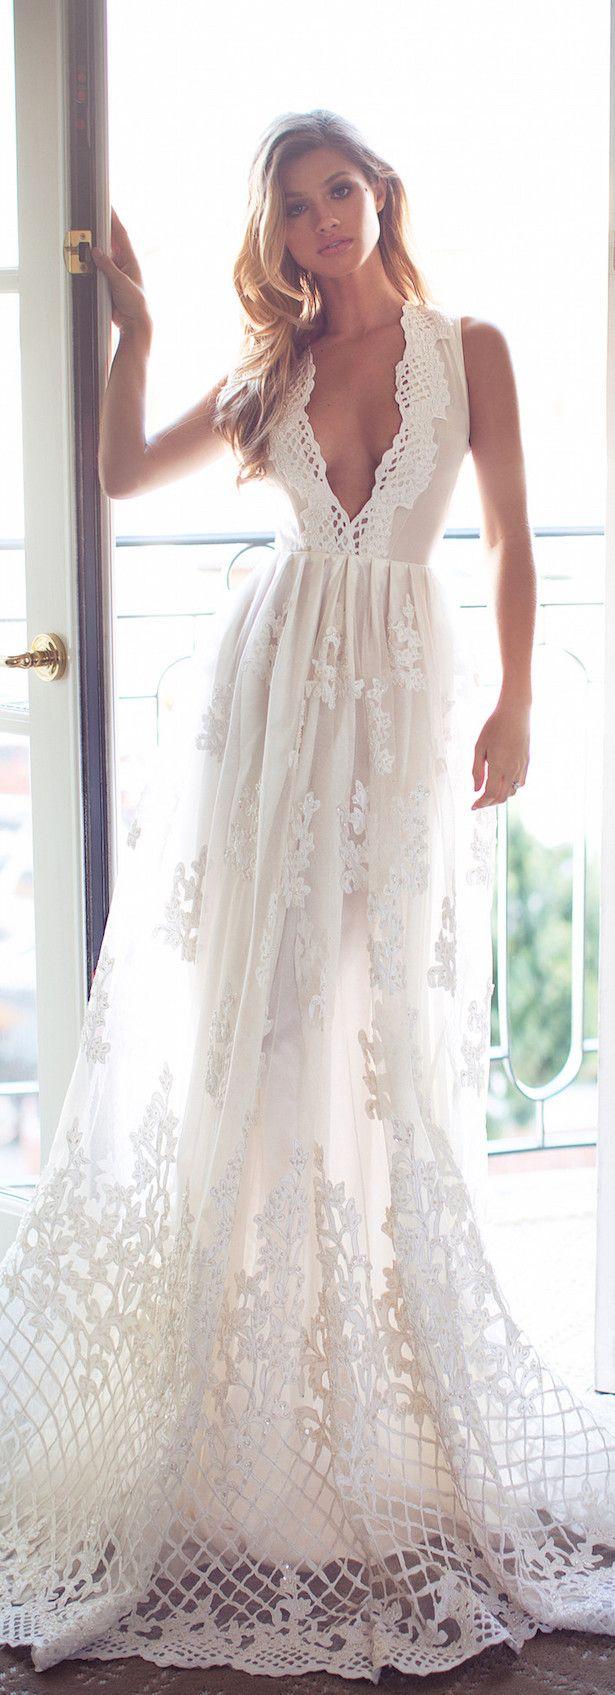 Lurelly Bridal